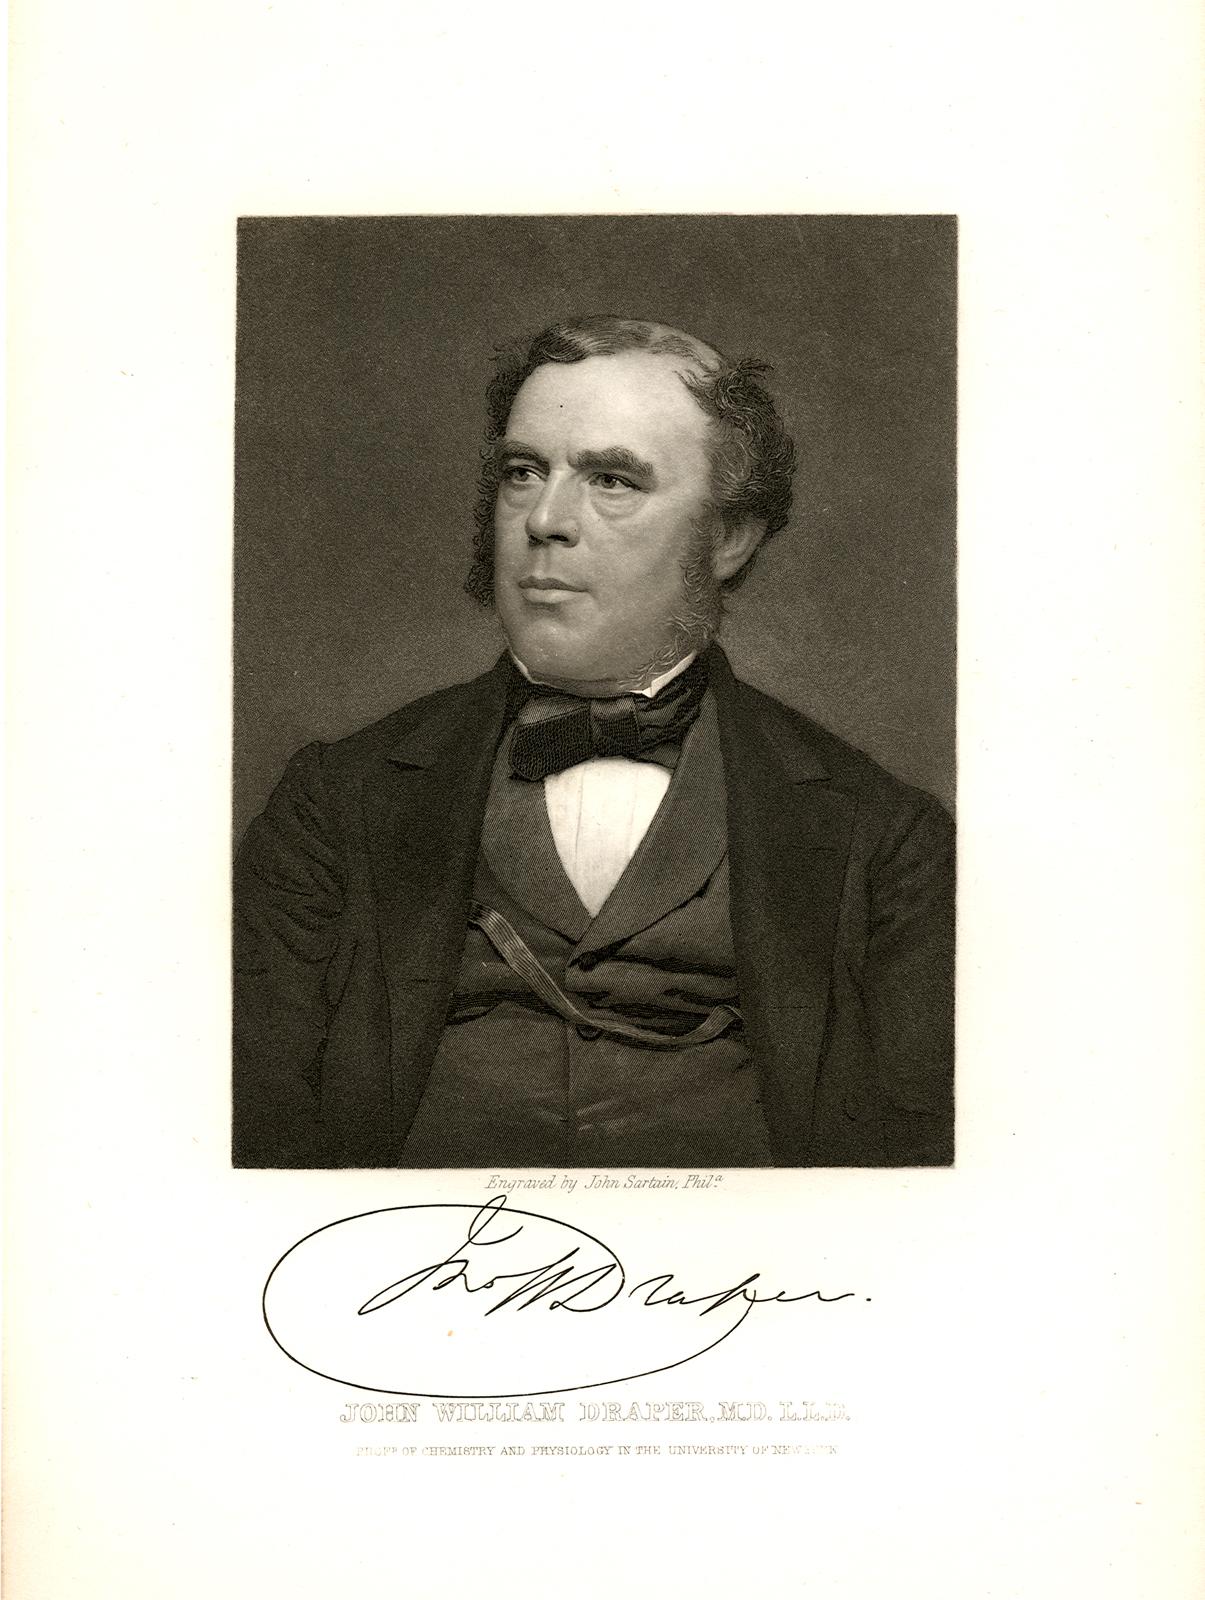 Engraving of John William Draper